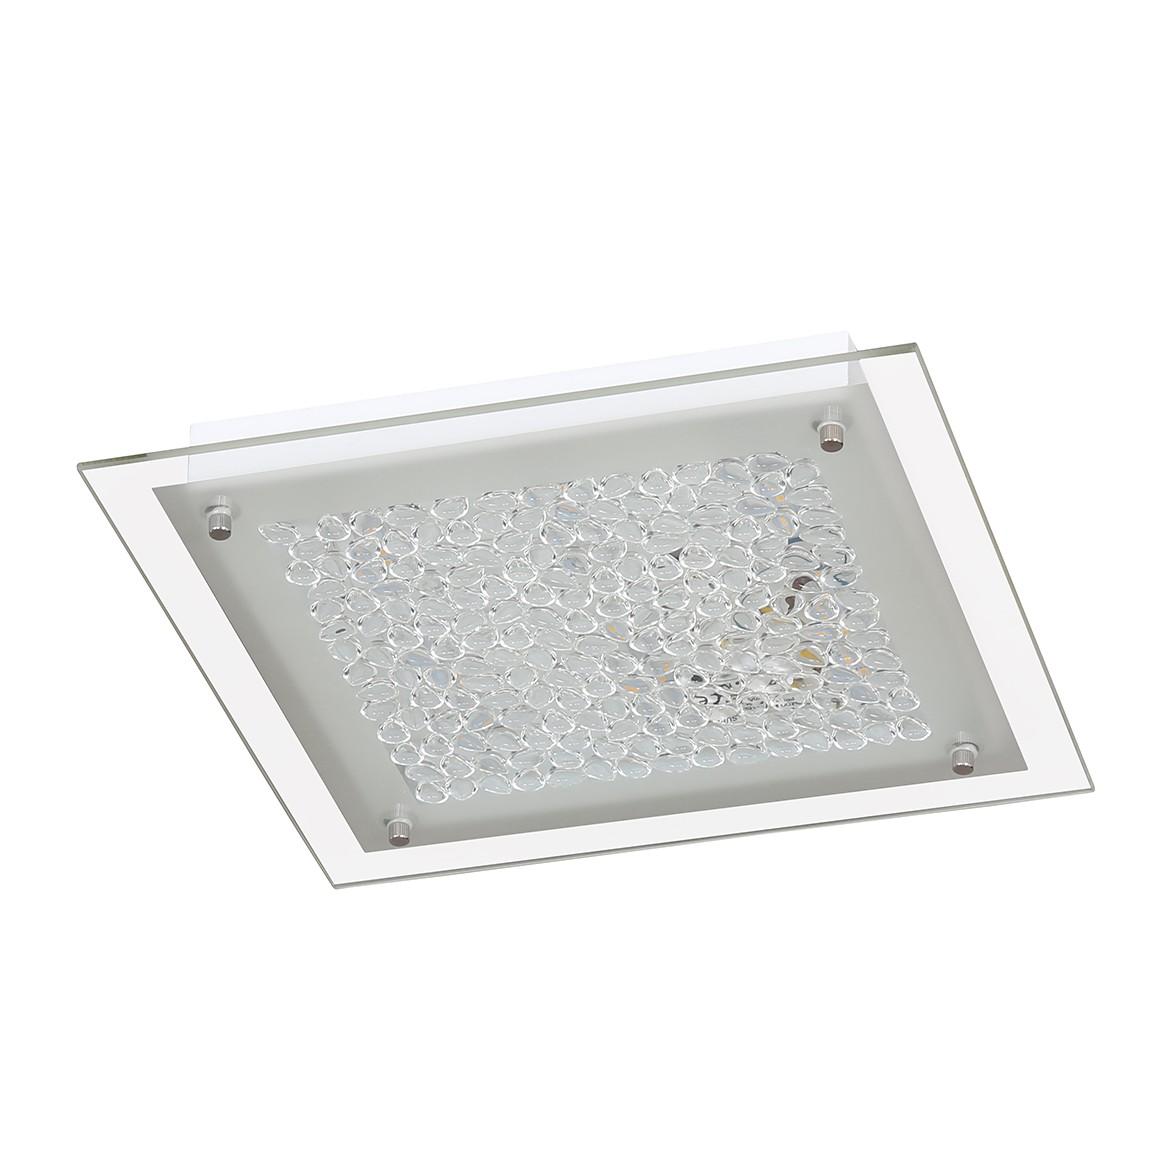 energie A+, Plafondlamp MERLE wit metaal 1 lichtbron, Action